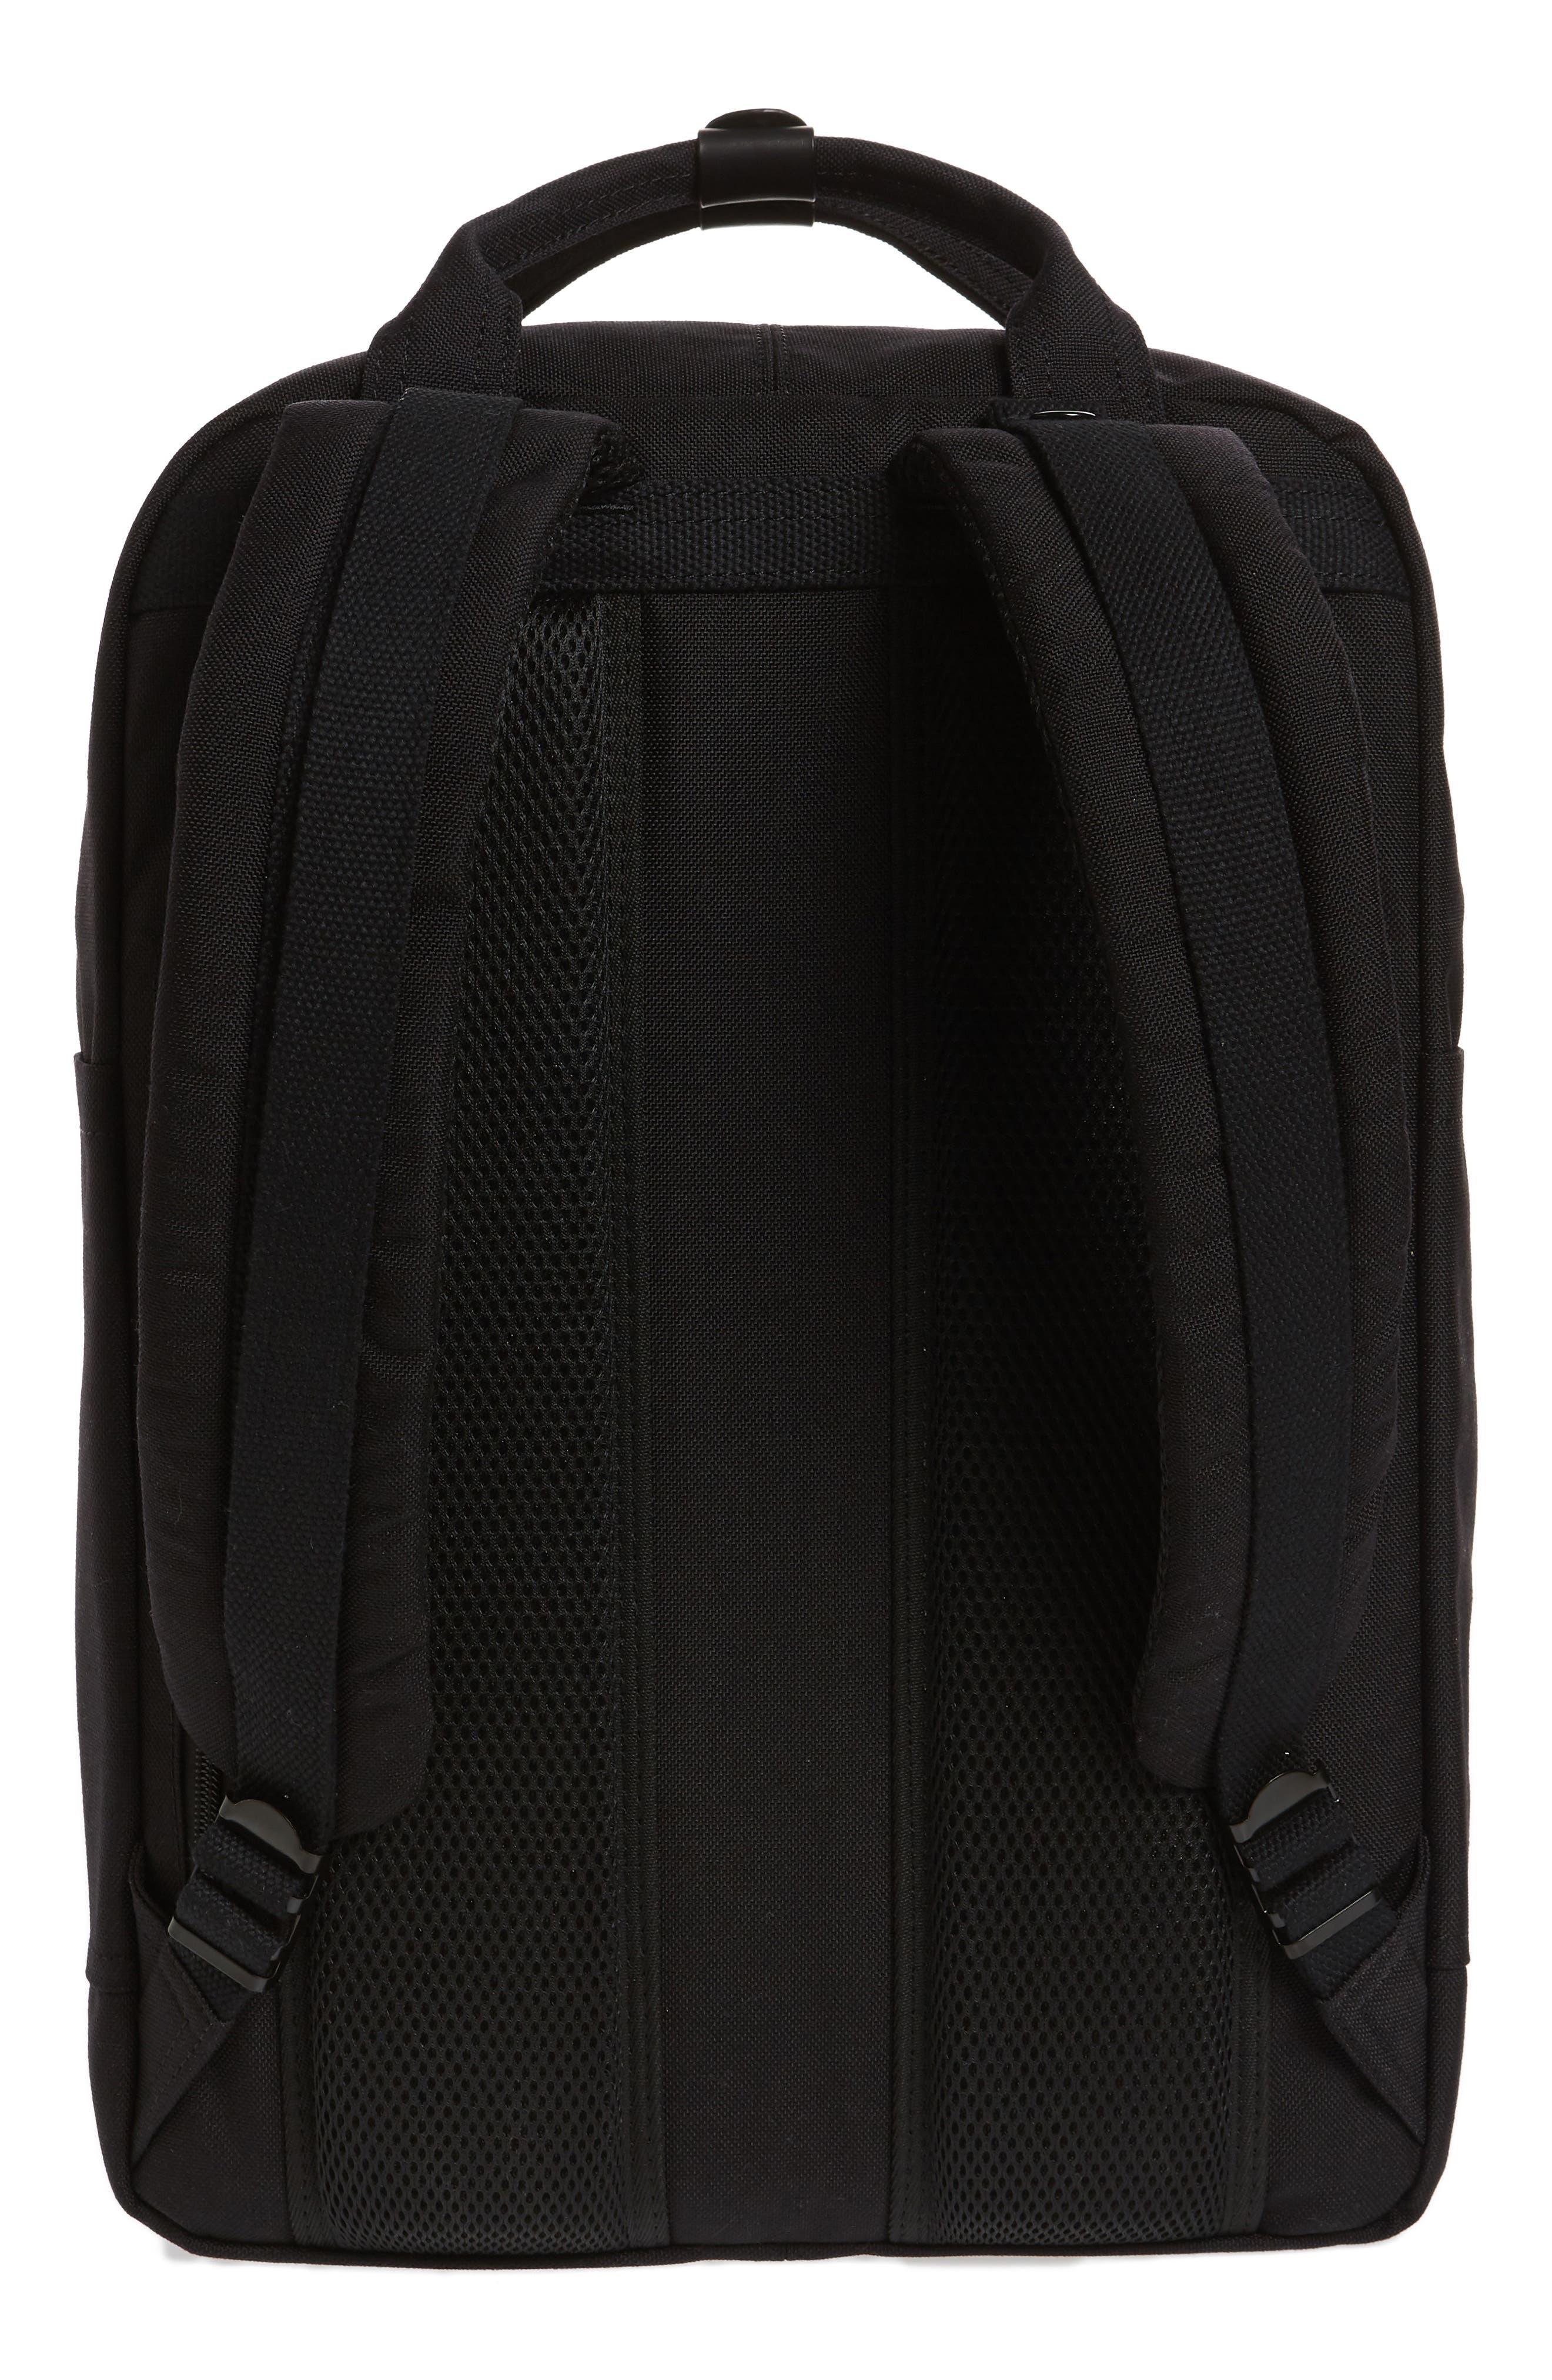 Macaroon Large Cordura<sup>®</sup> Black Series Water Repellent Backpack,                             Alternate thumbnail 3, color,                             Black